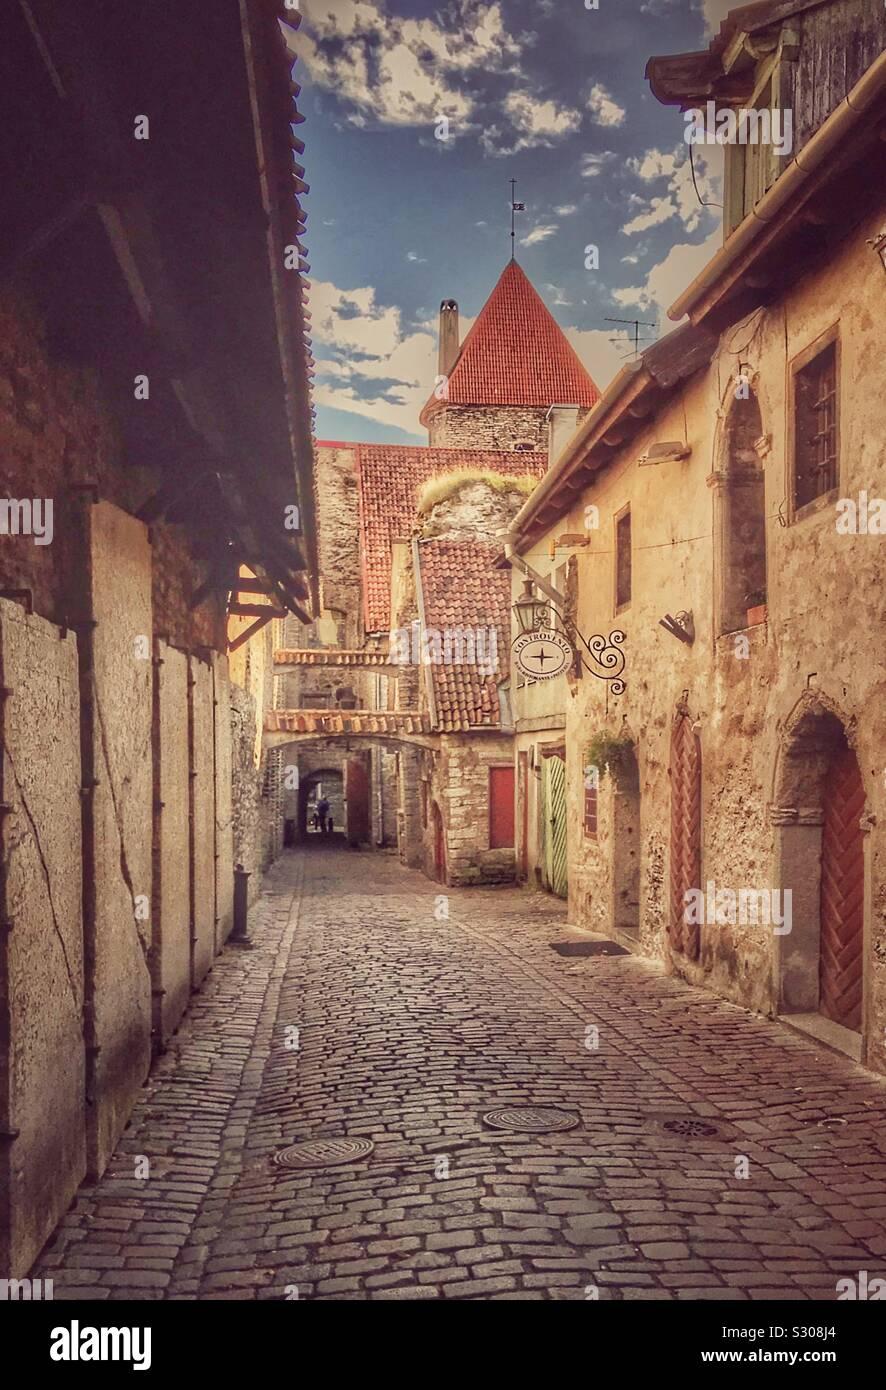 Pasaje de Santa Catalina (Katariina kaik) en el casco antiguo de Tallin, Estonia Foto de stock